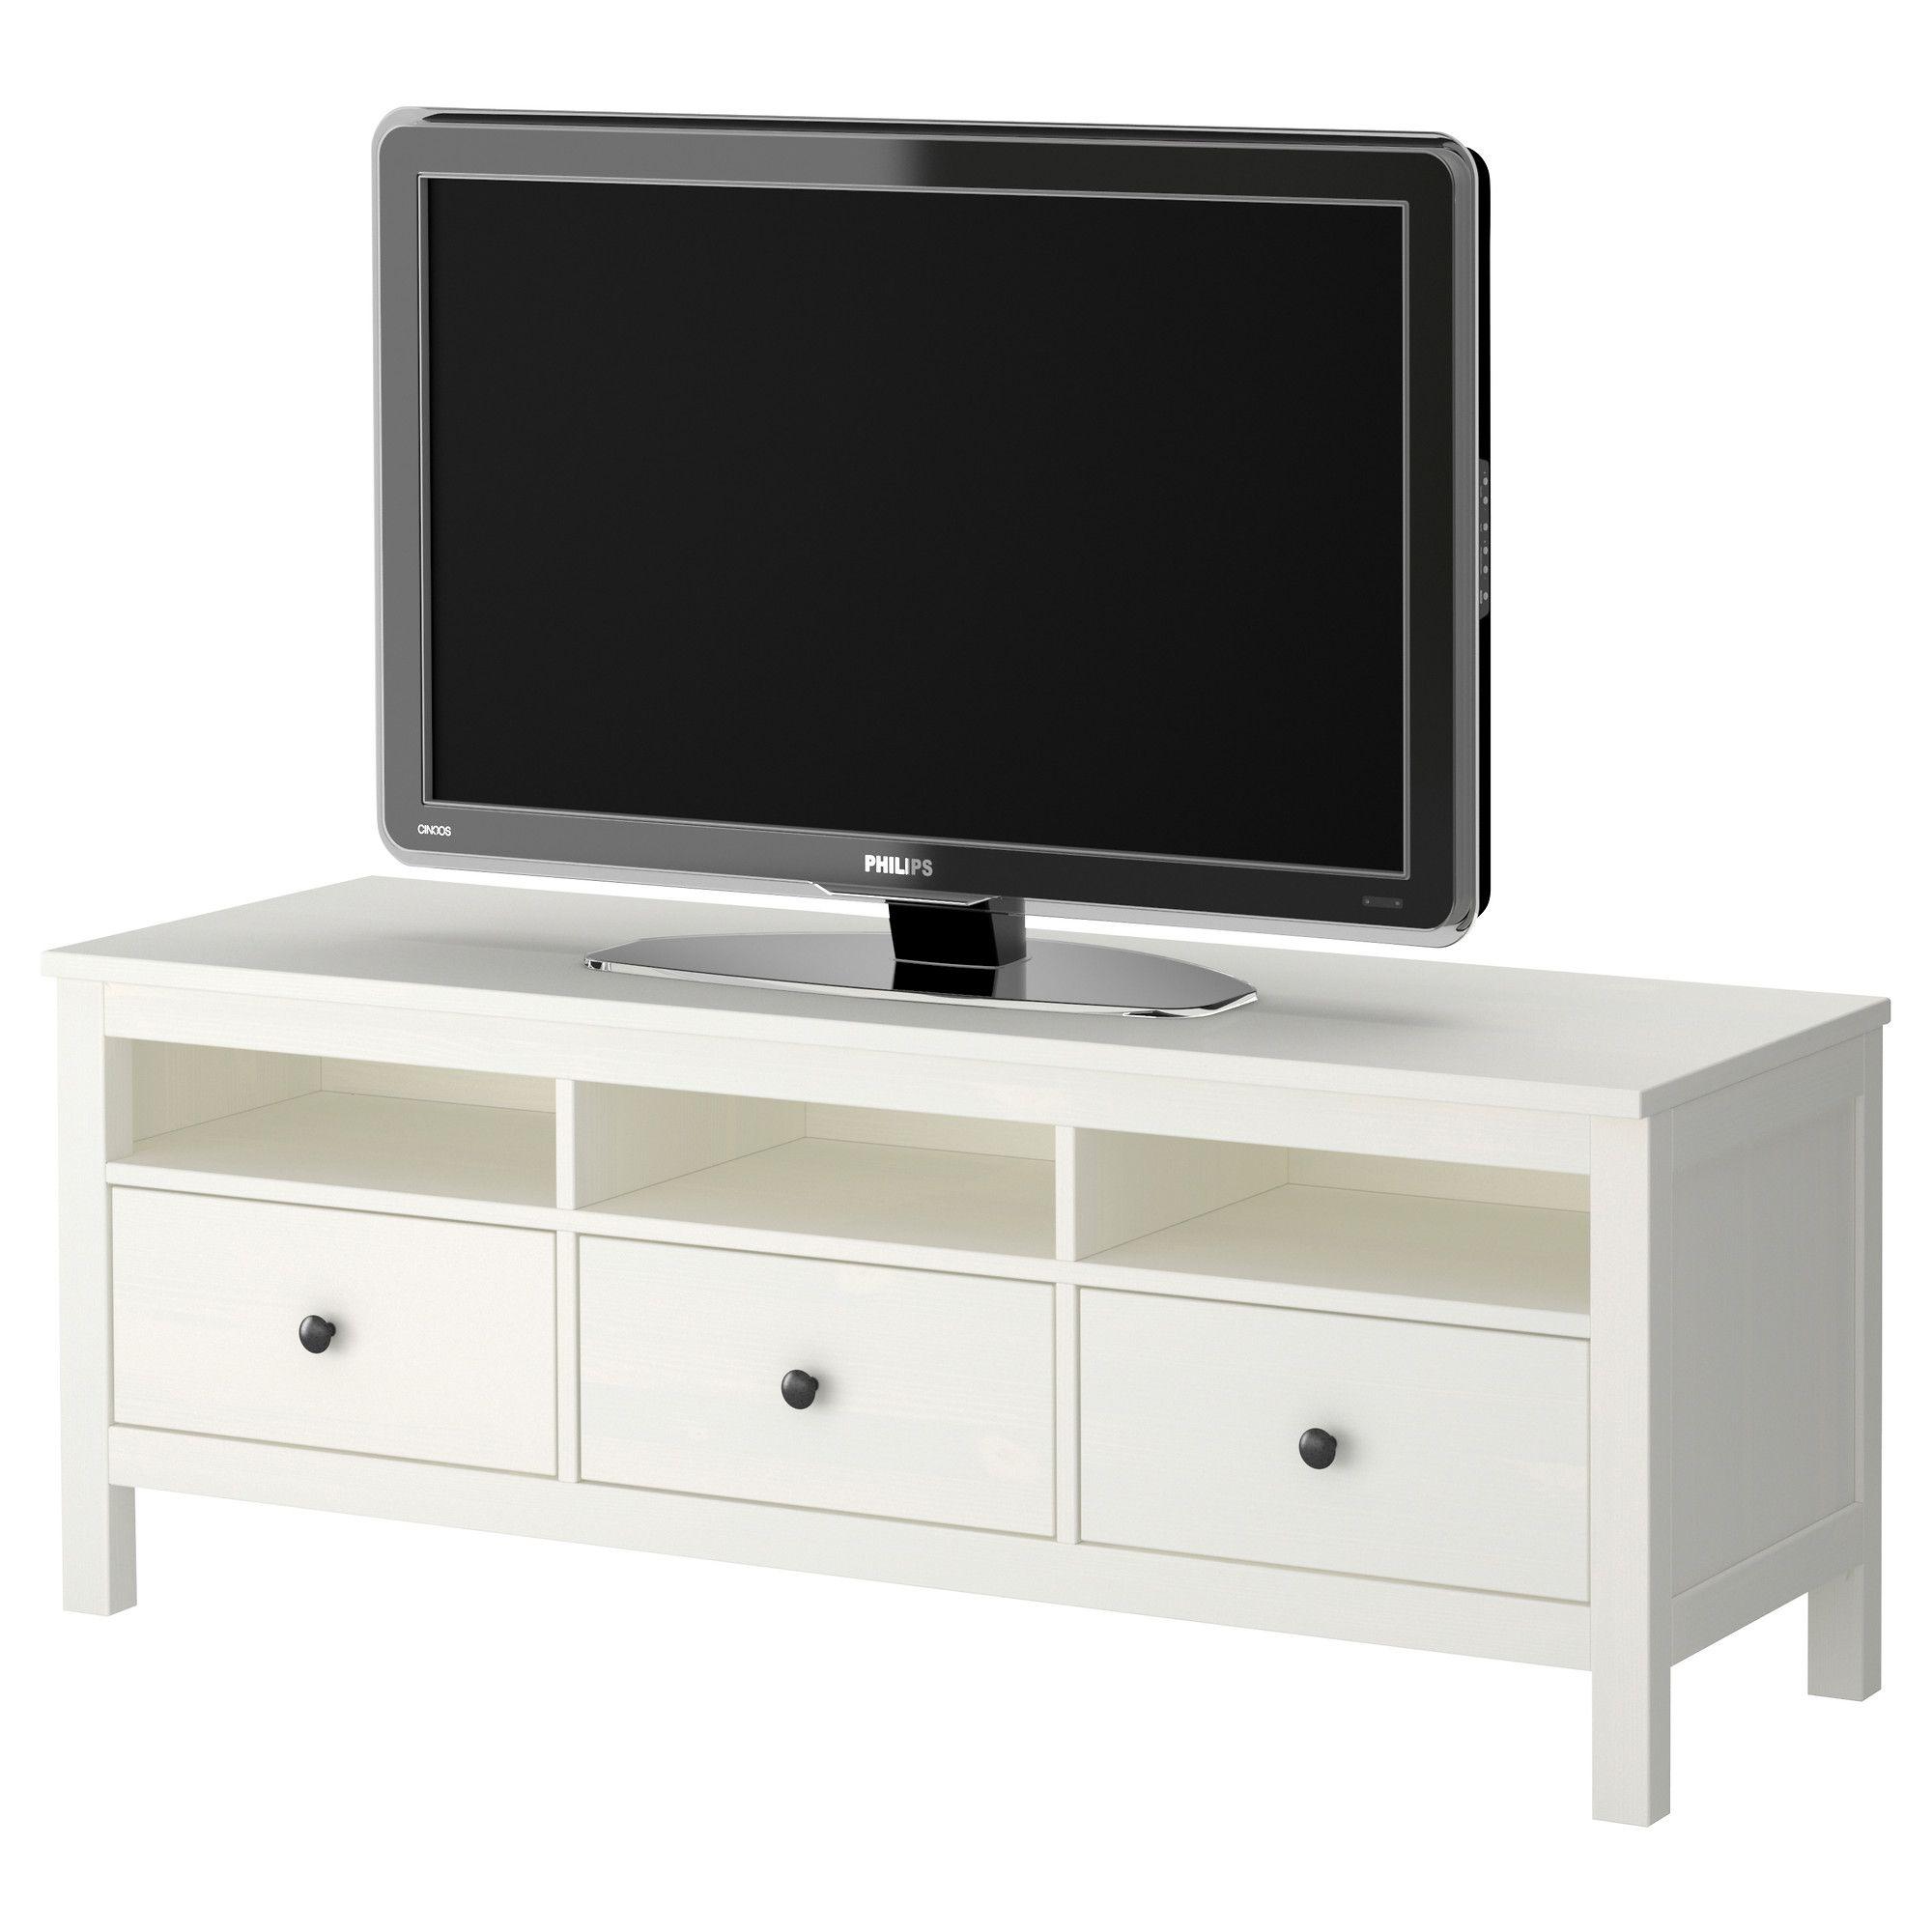 Hemnes mueble tv blanco ikea decoraci n muebles - Muebles television ikea ...